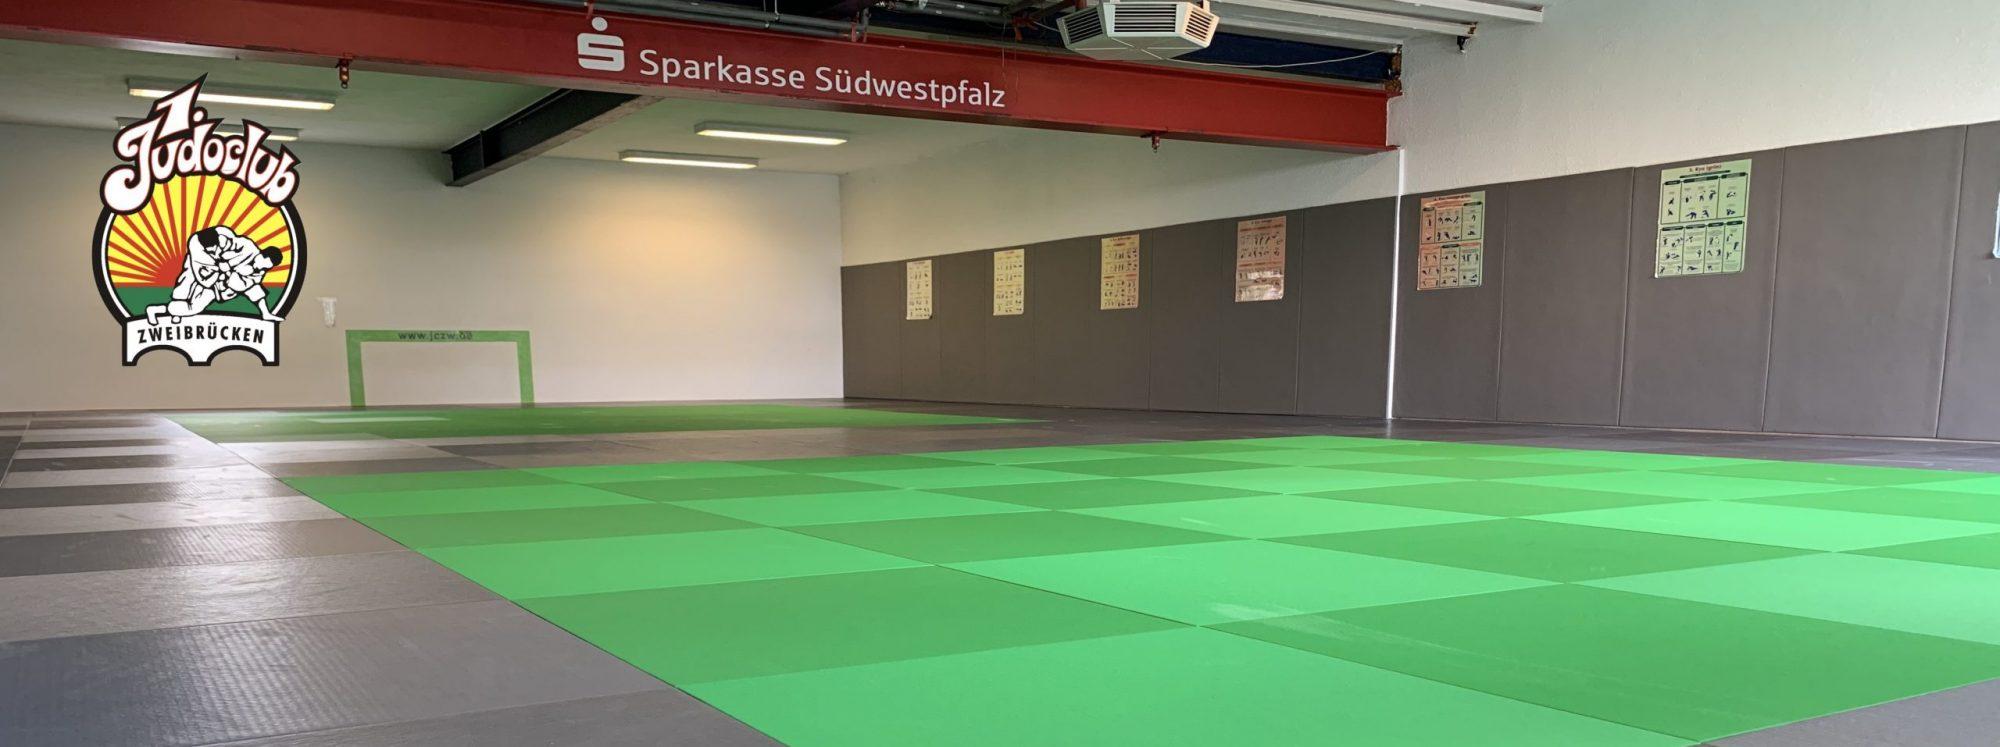 1. Judoclub Zweibrücken 1957 e.V.